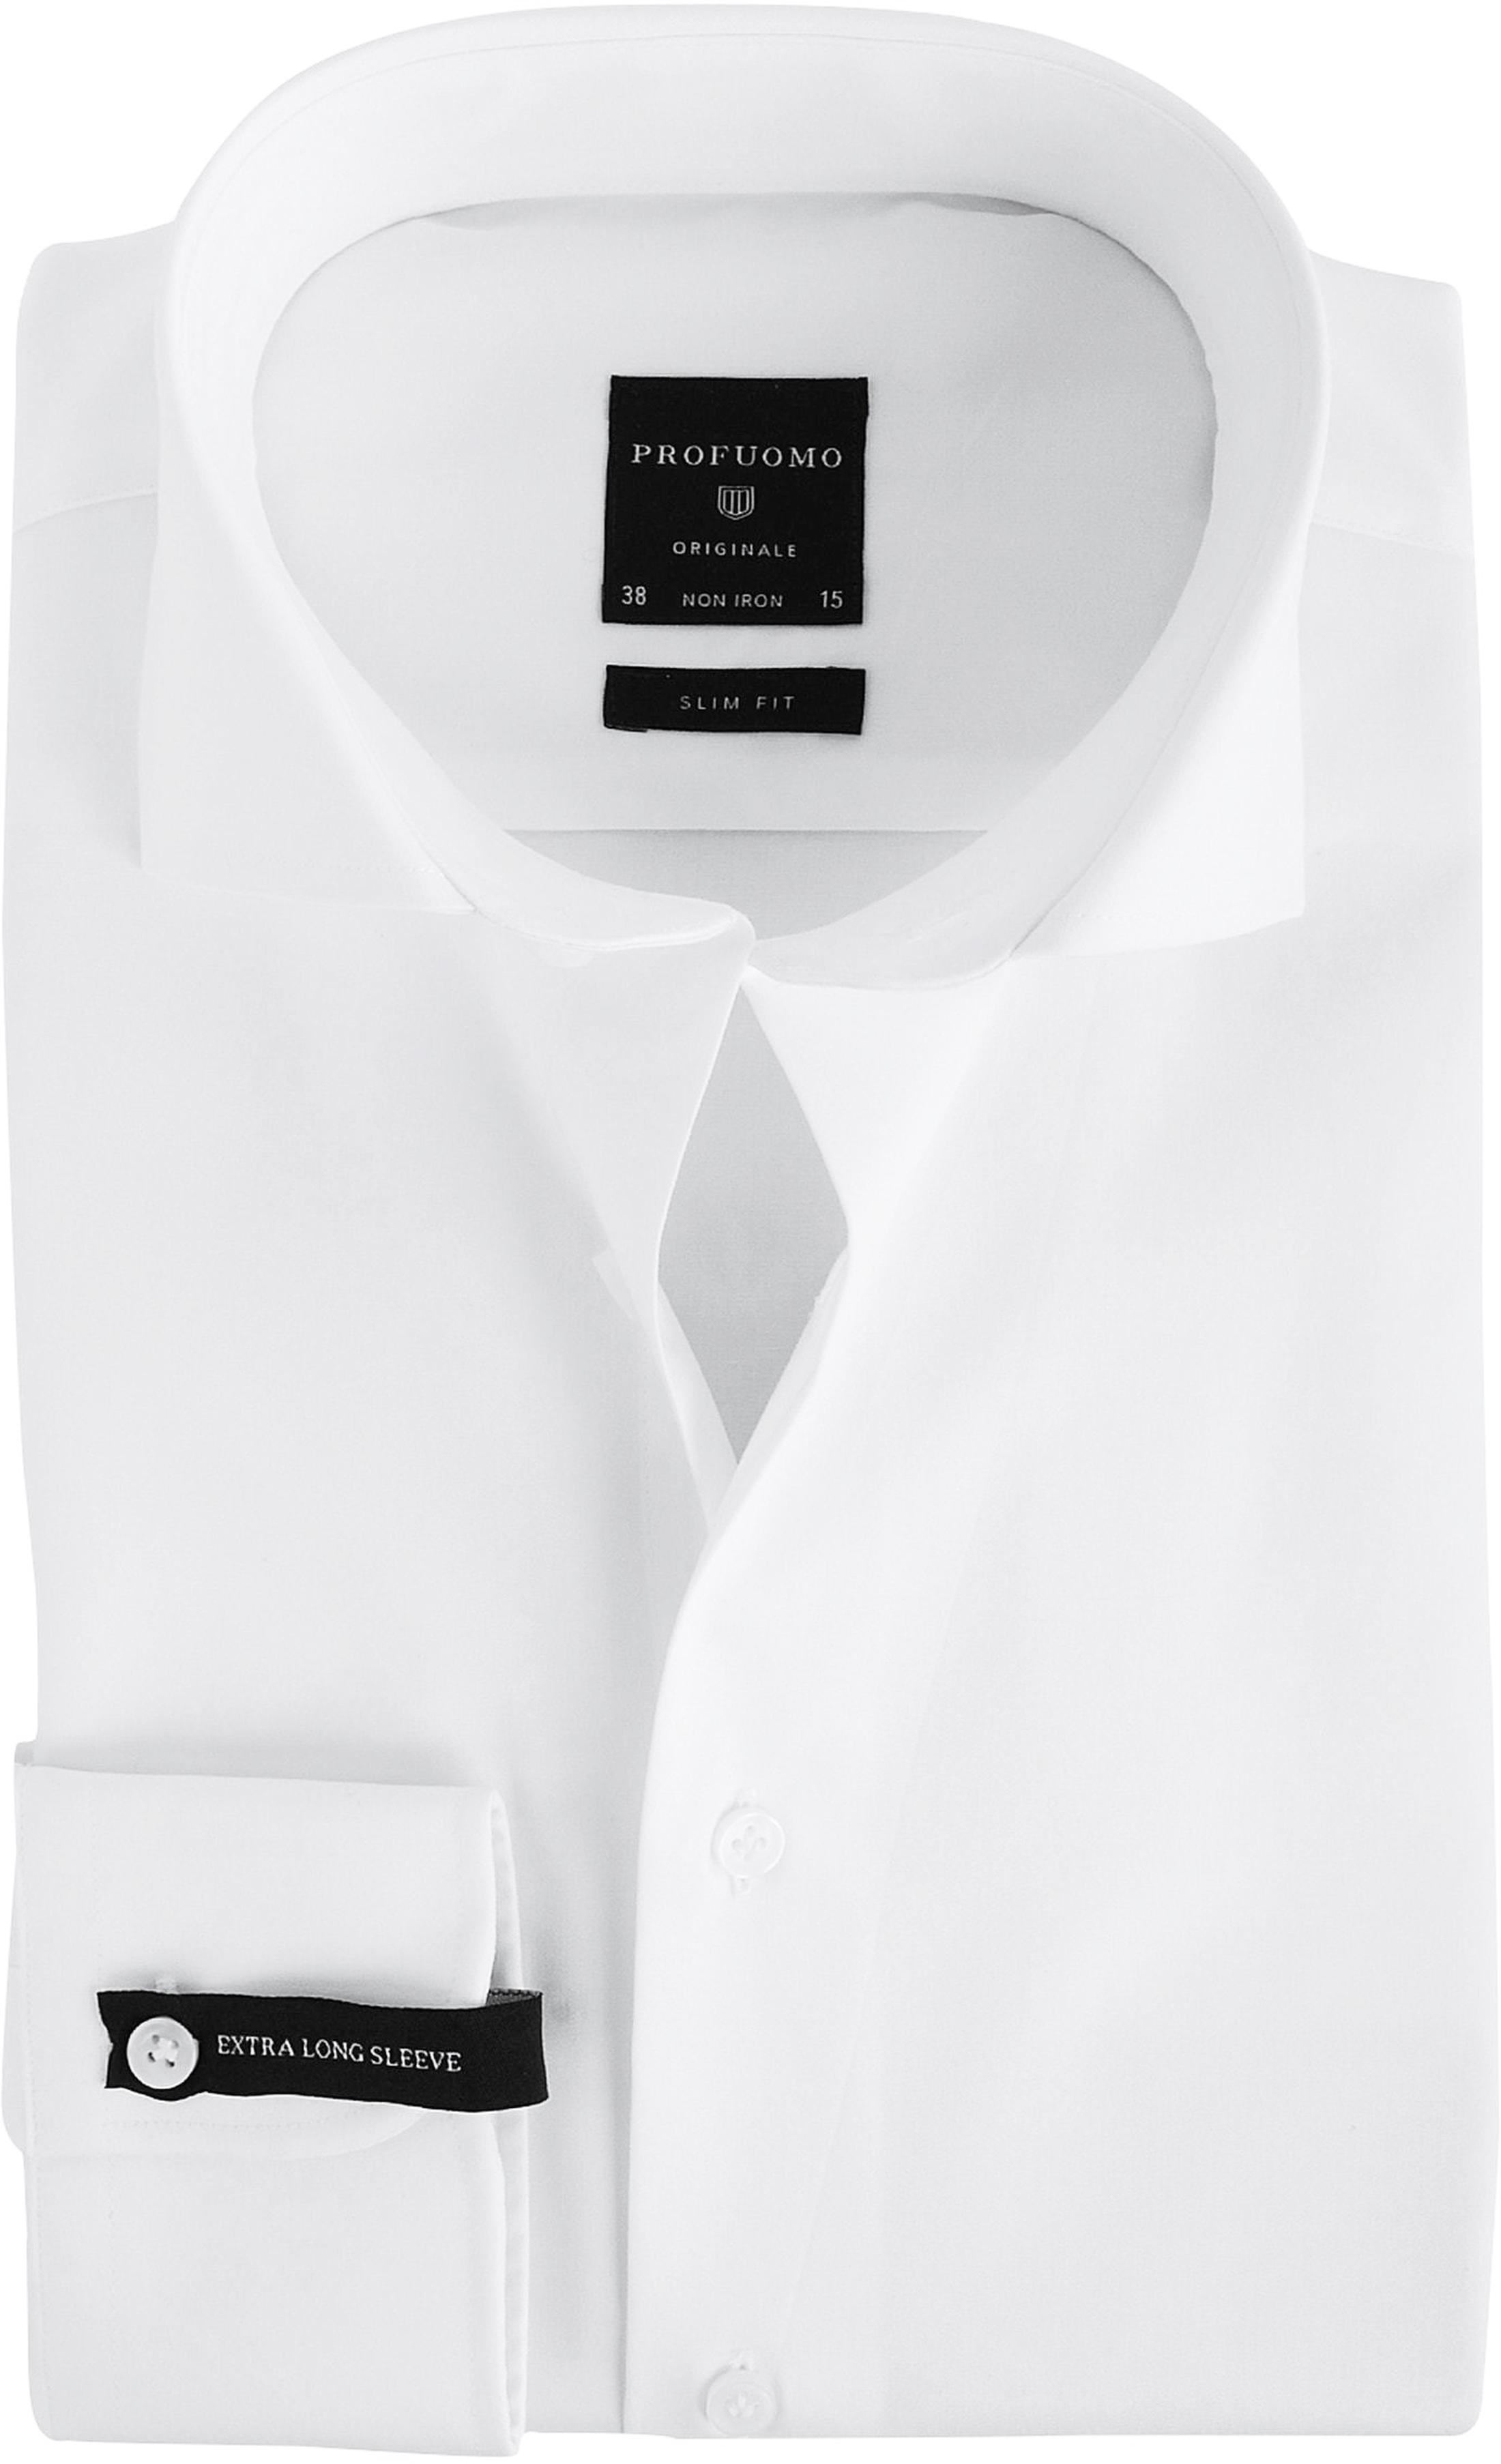 Profuomo Hemd SL7 Cutaway Weiß